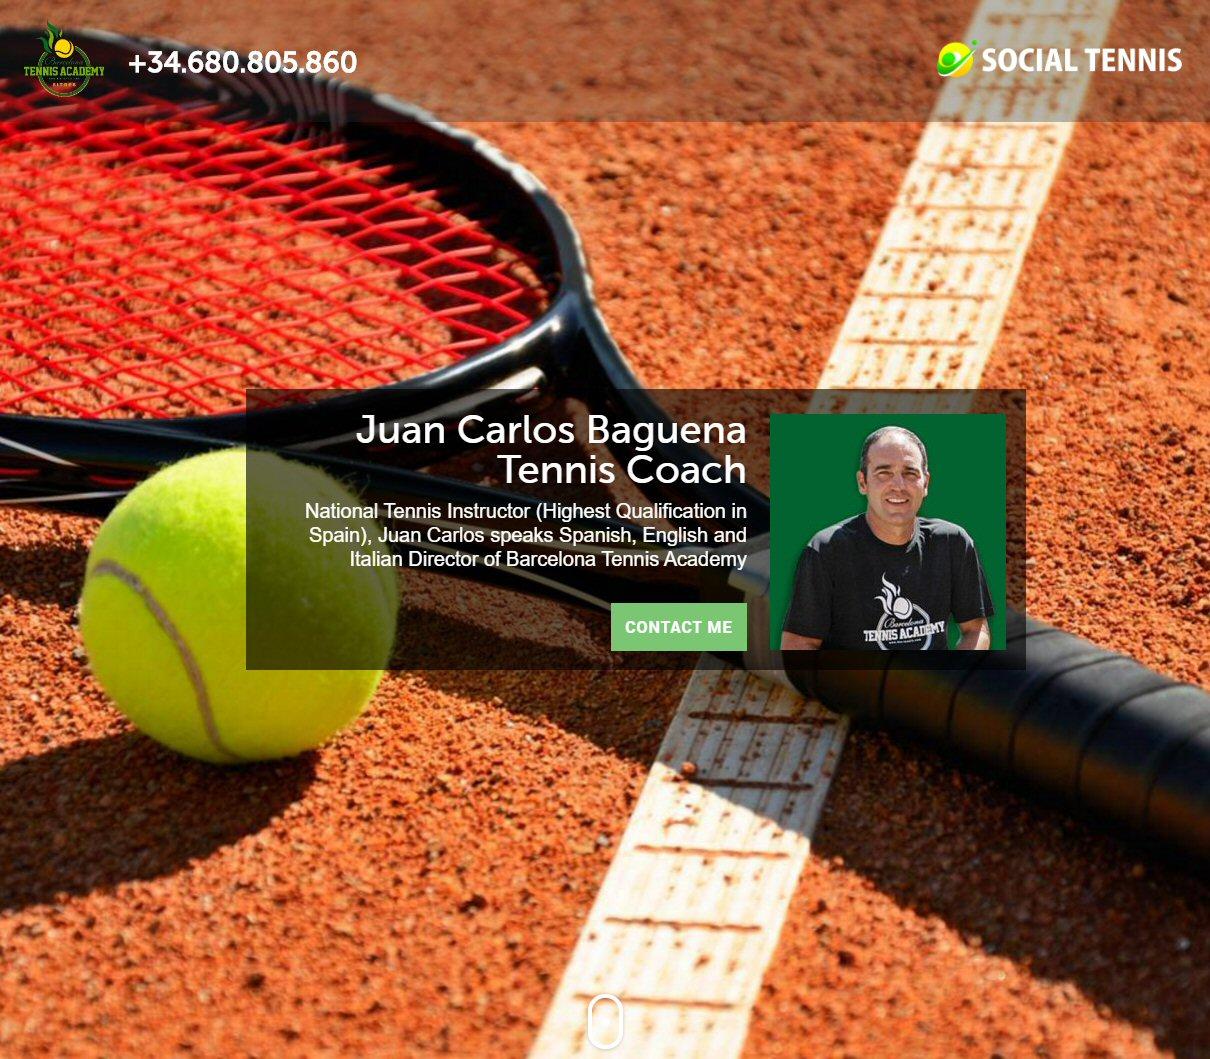 tennis coach webpage